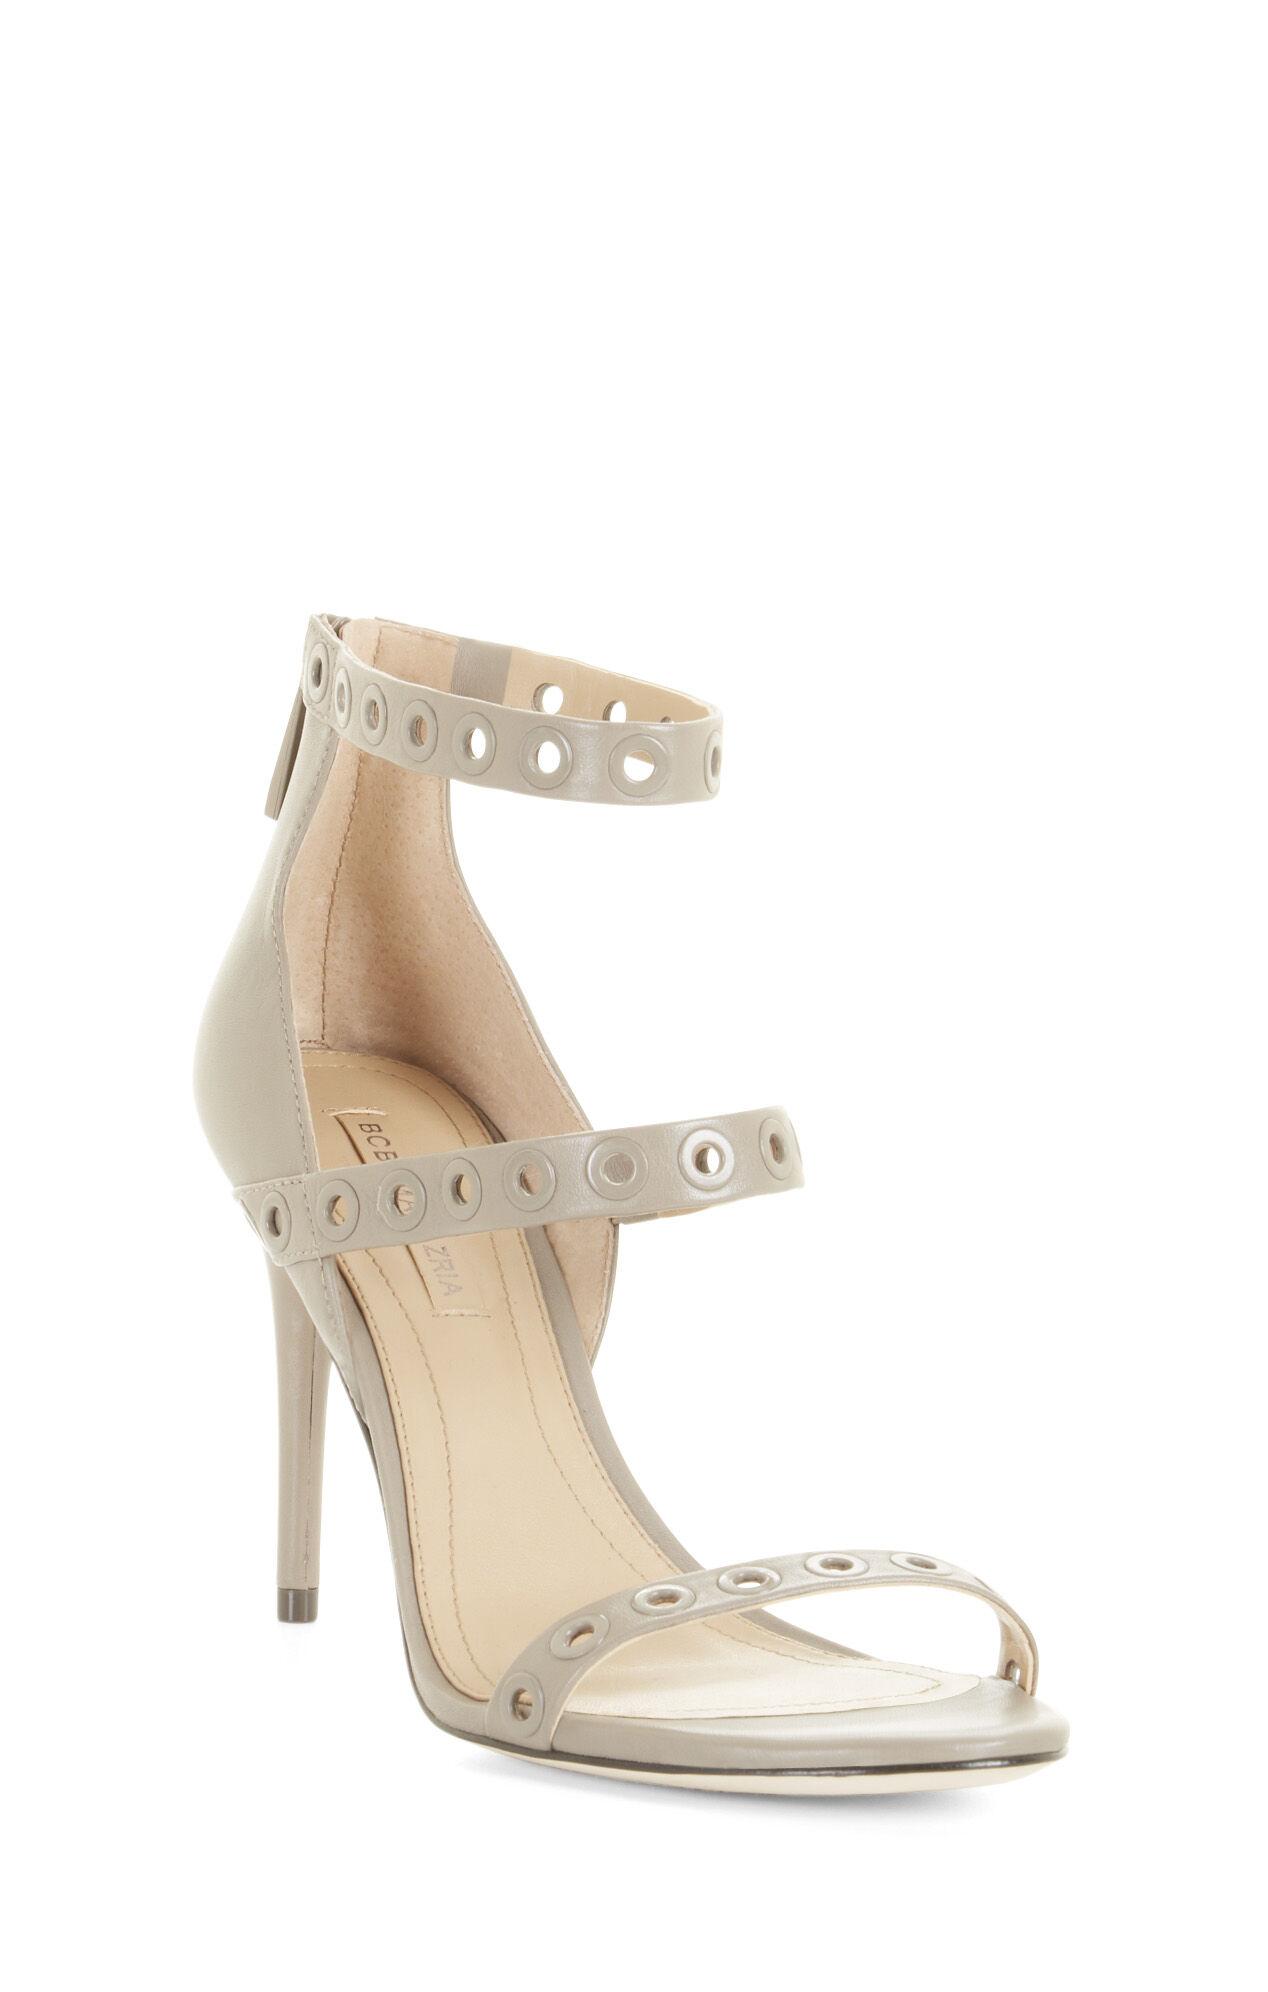 Parry Mid-Heel Grommet Day Sandal